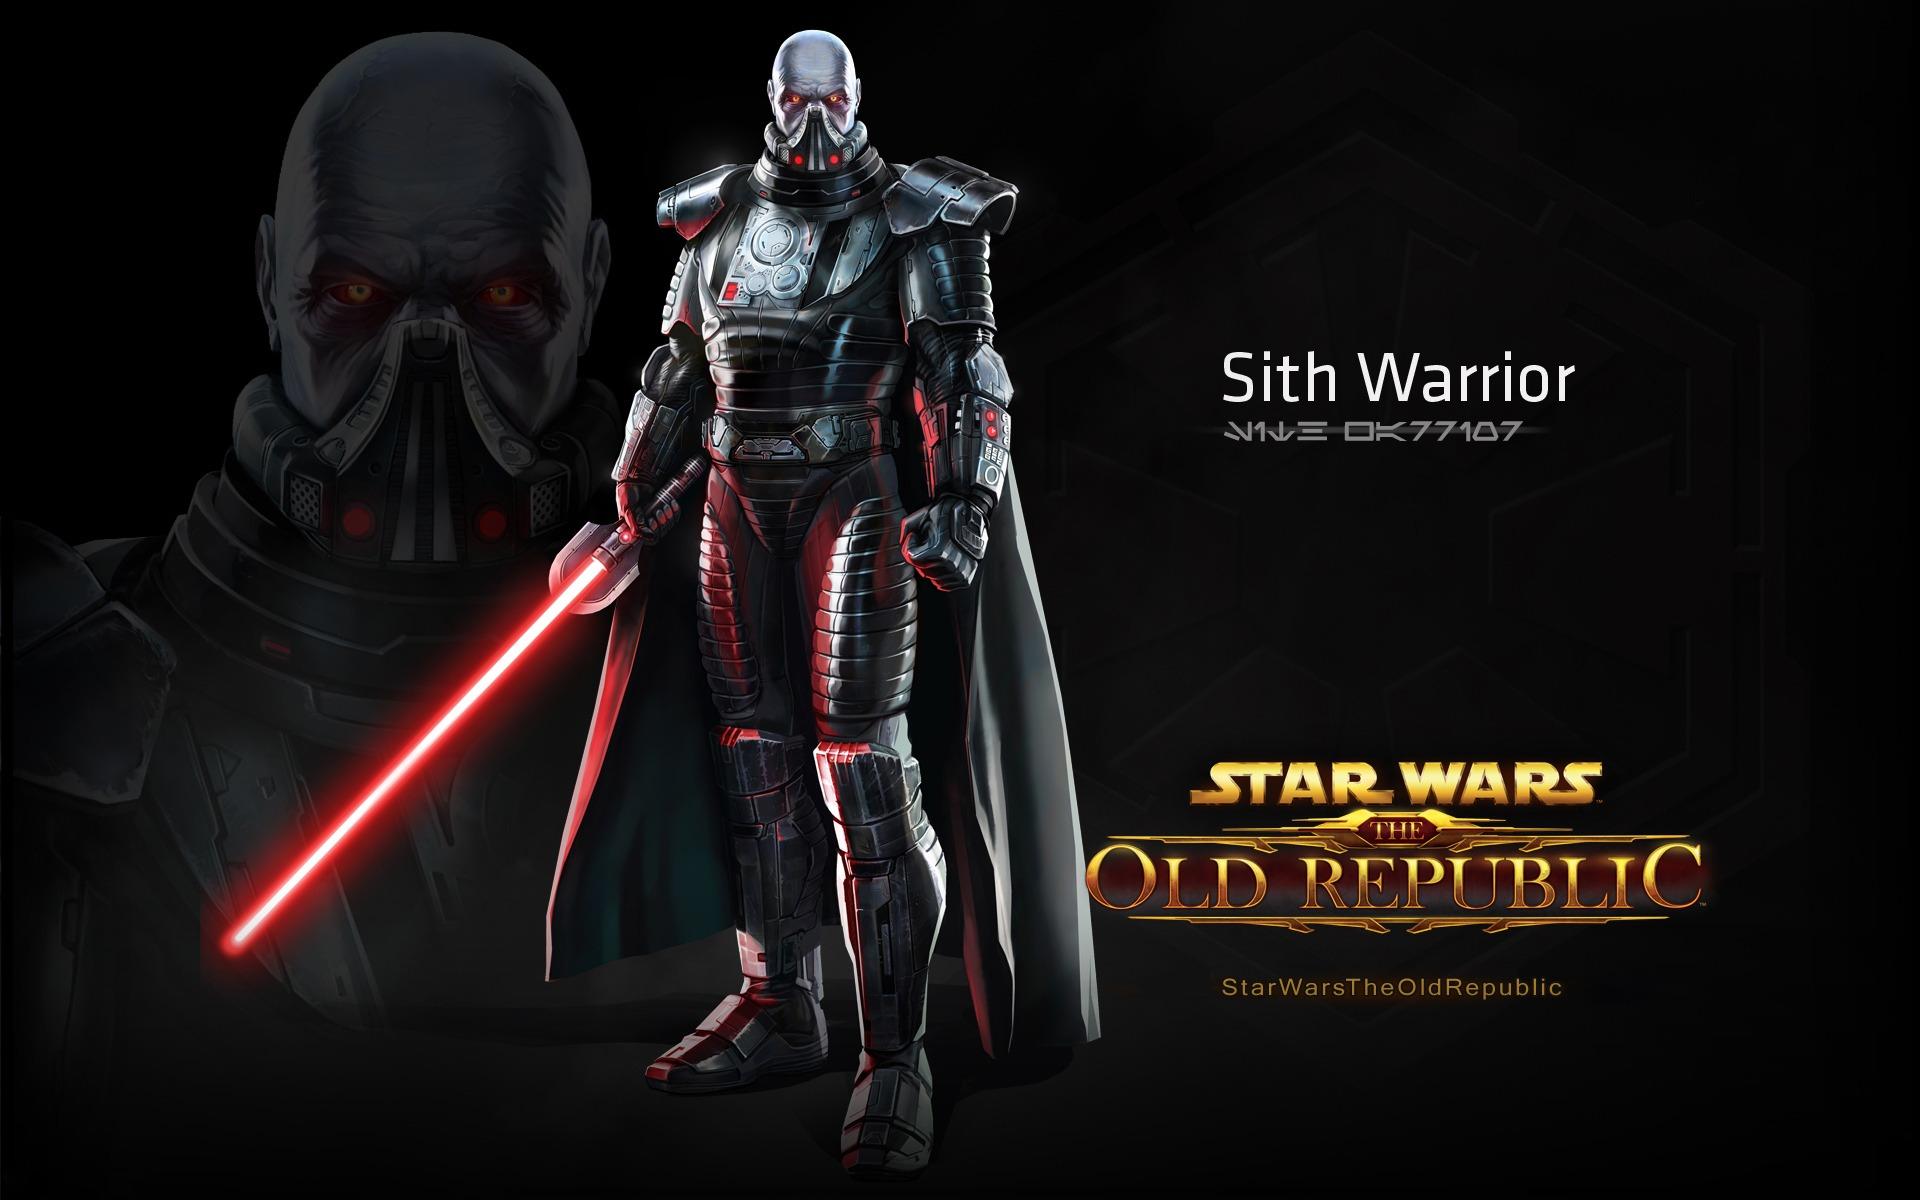 Star Wars The Old Republic Sith Warrior wallpaper   469823 1920x1200